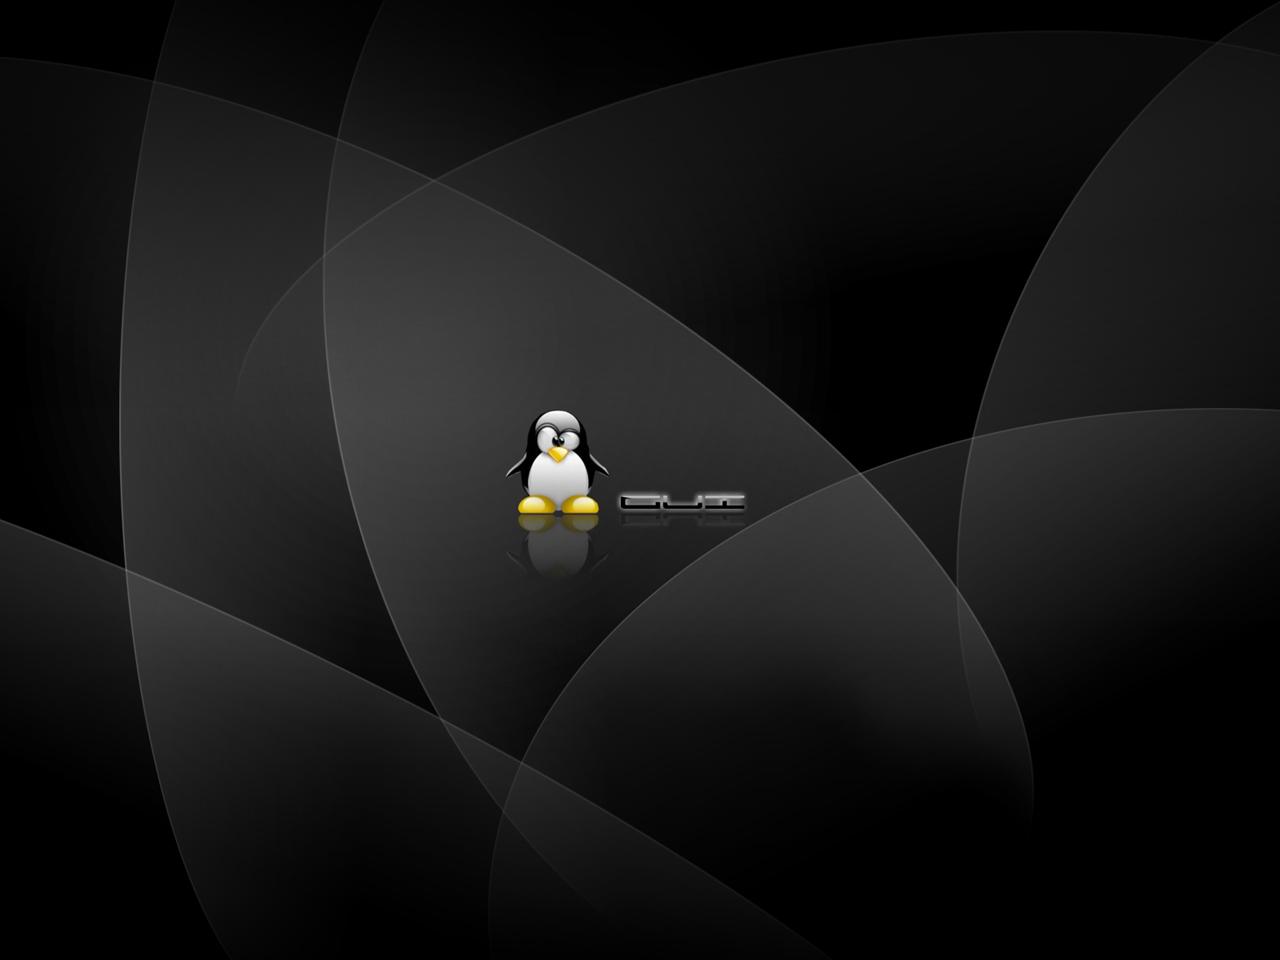 best desktop wallpaper ever   wwwwallpapers in hdcom 1280x960